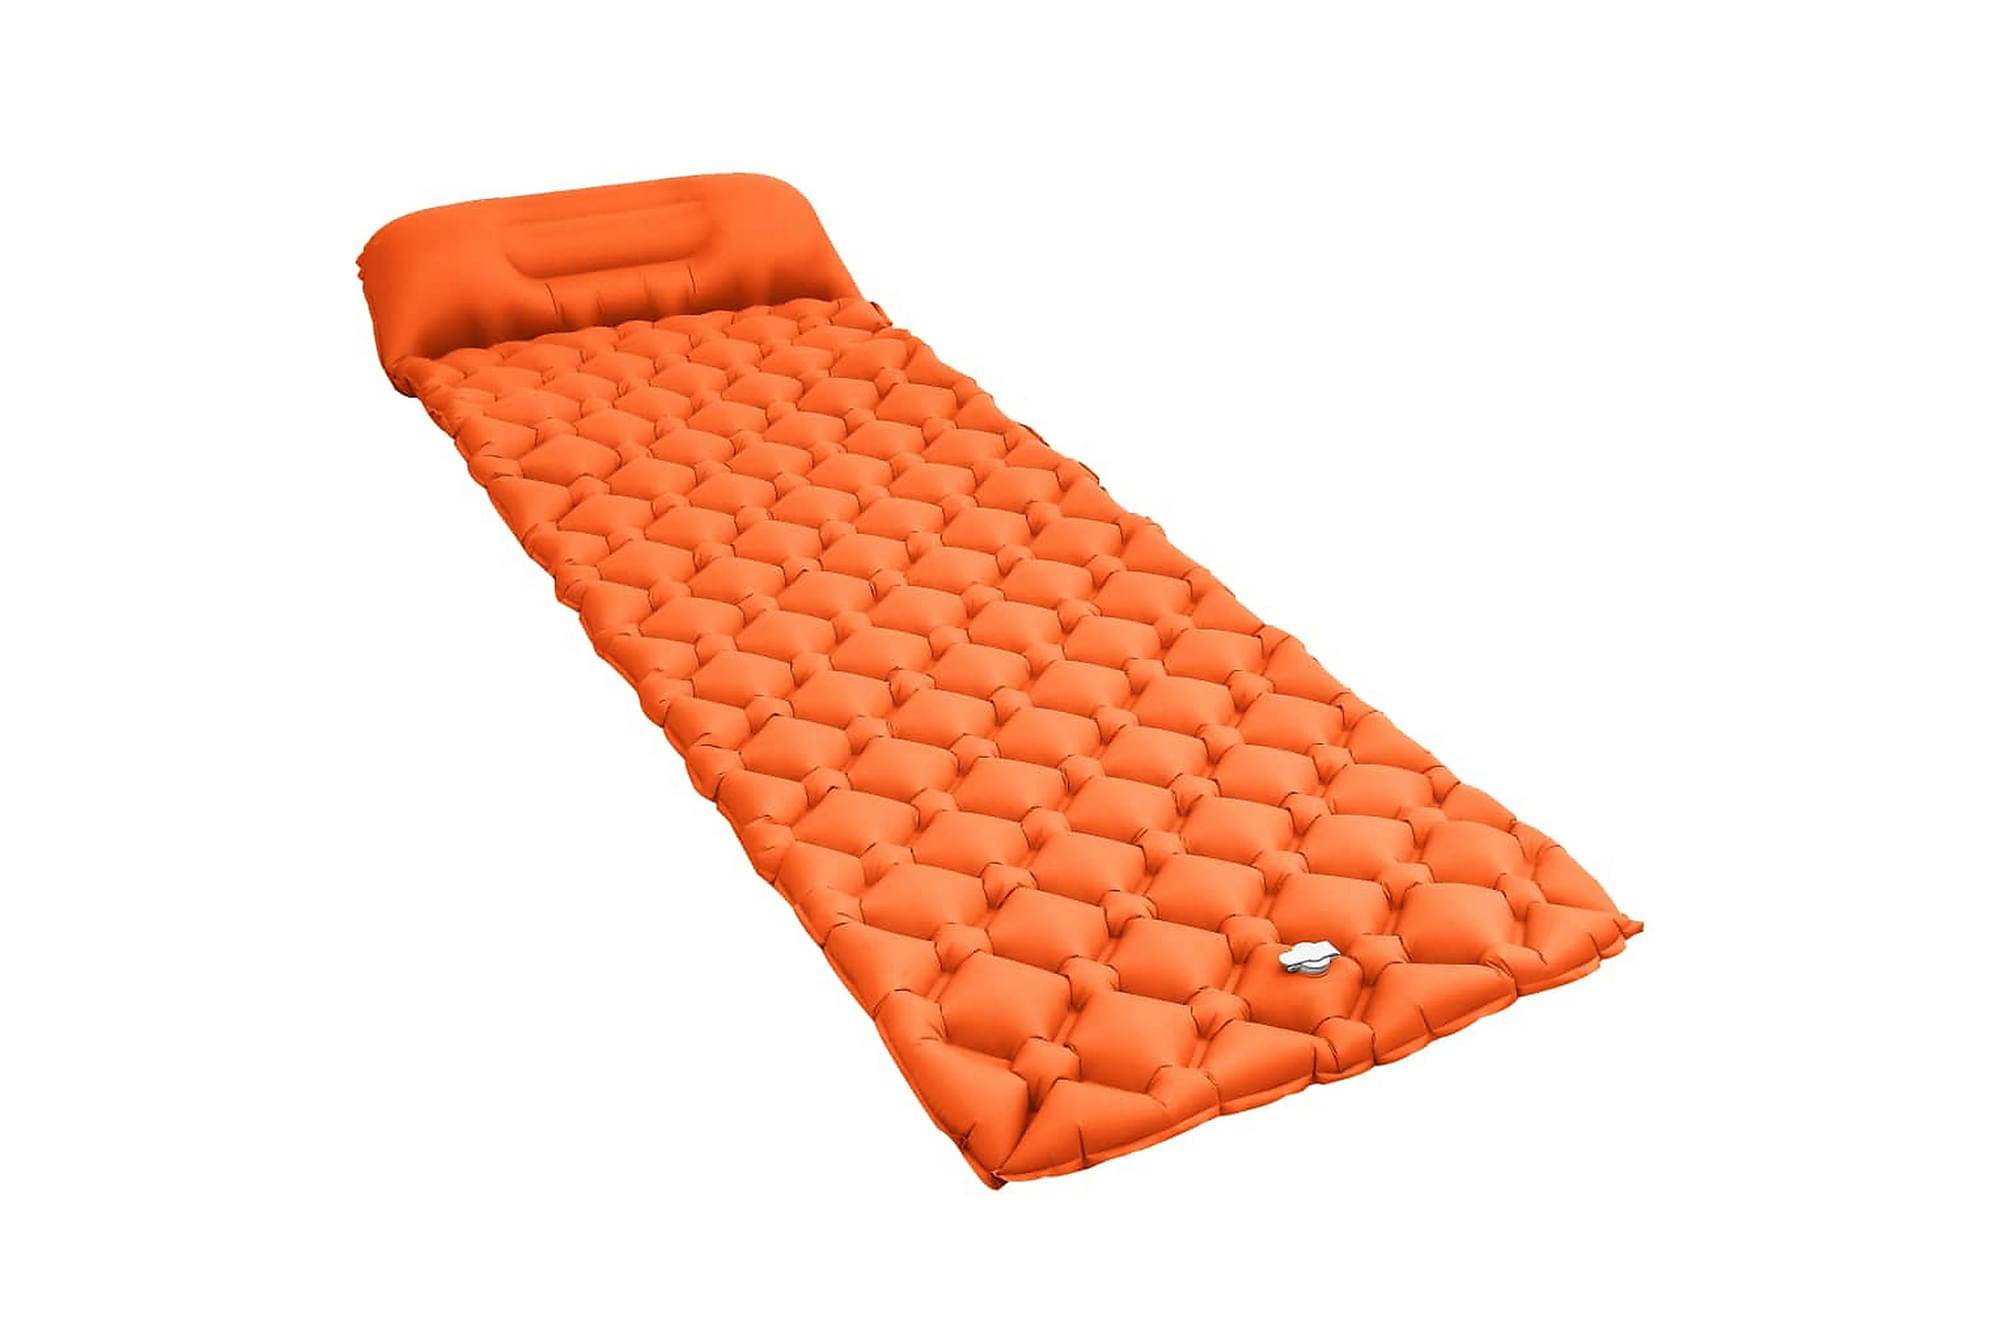 Luftmadrass med kudde 58x190 cm orange, Luftmadrasser & uppblåsbara madrass